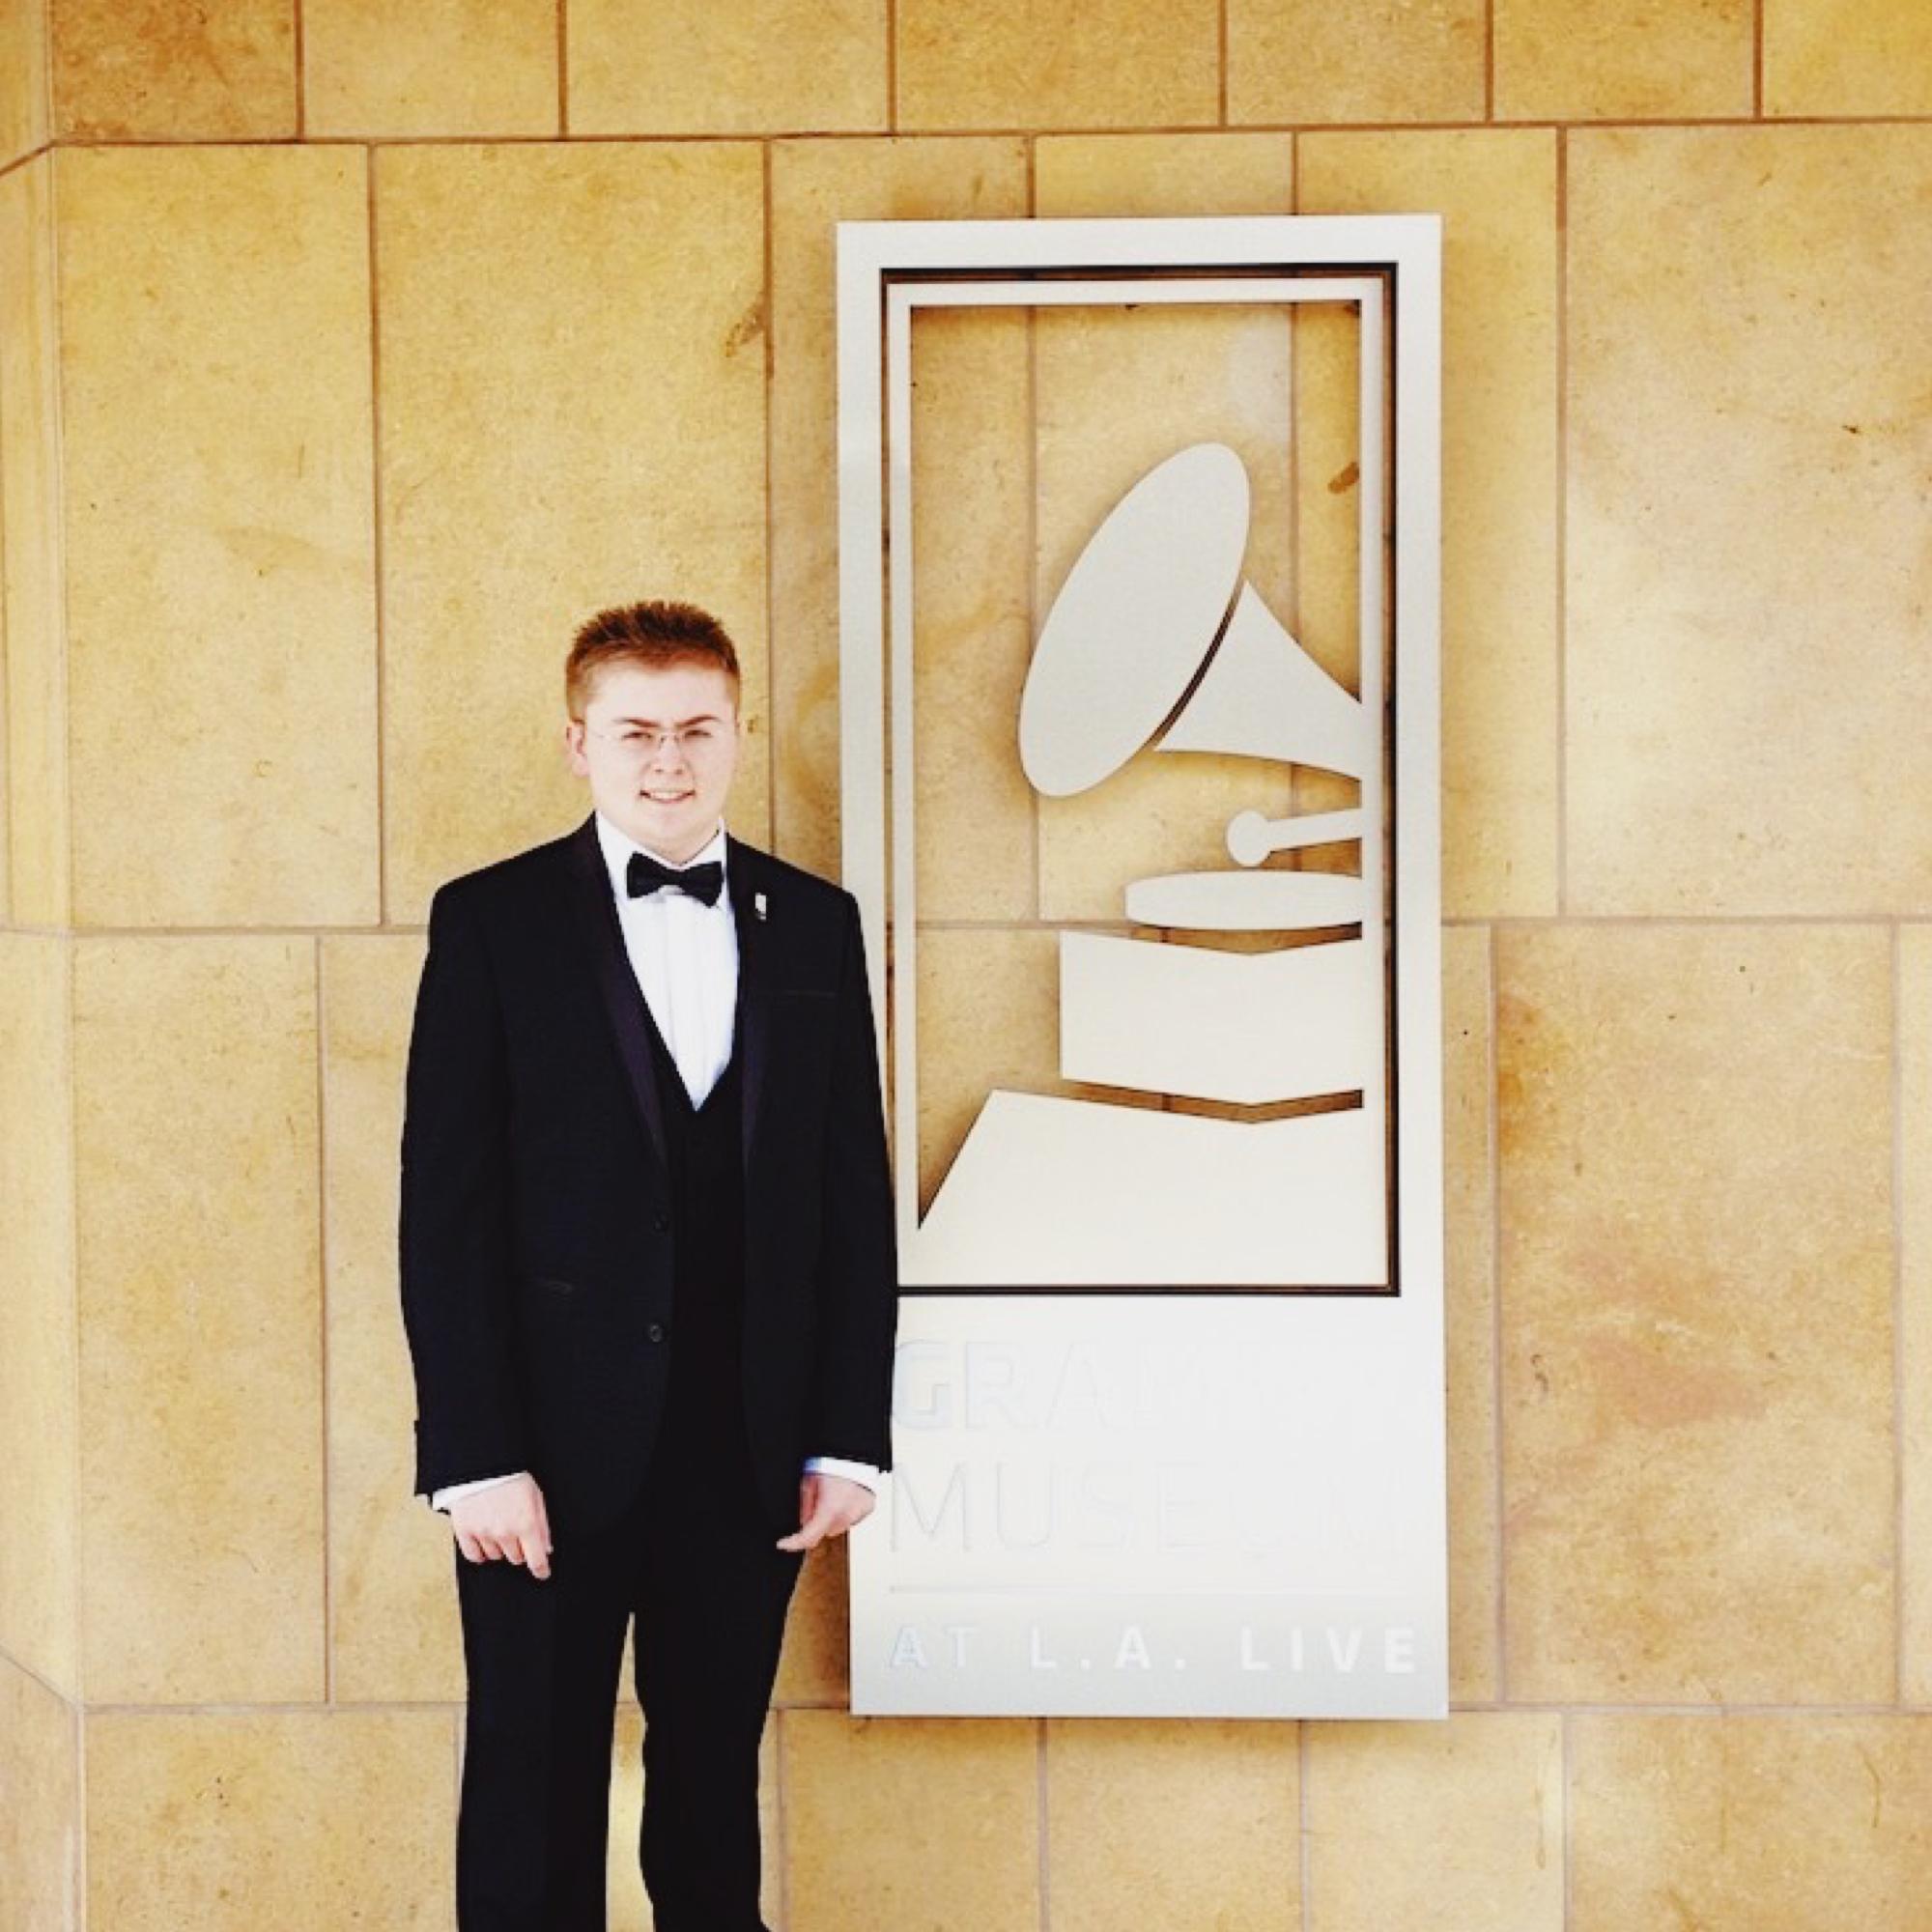 Jack Watkins at the Grammy Awards in Los Angeles